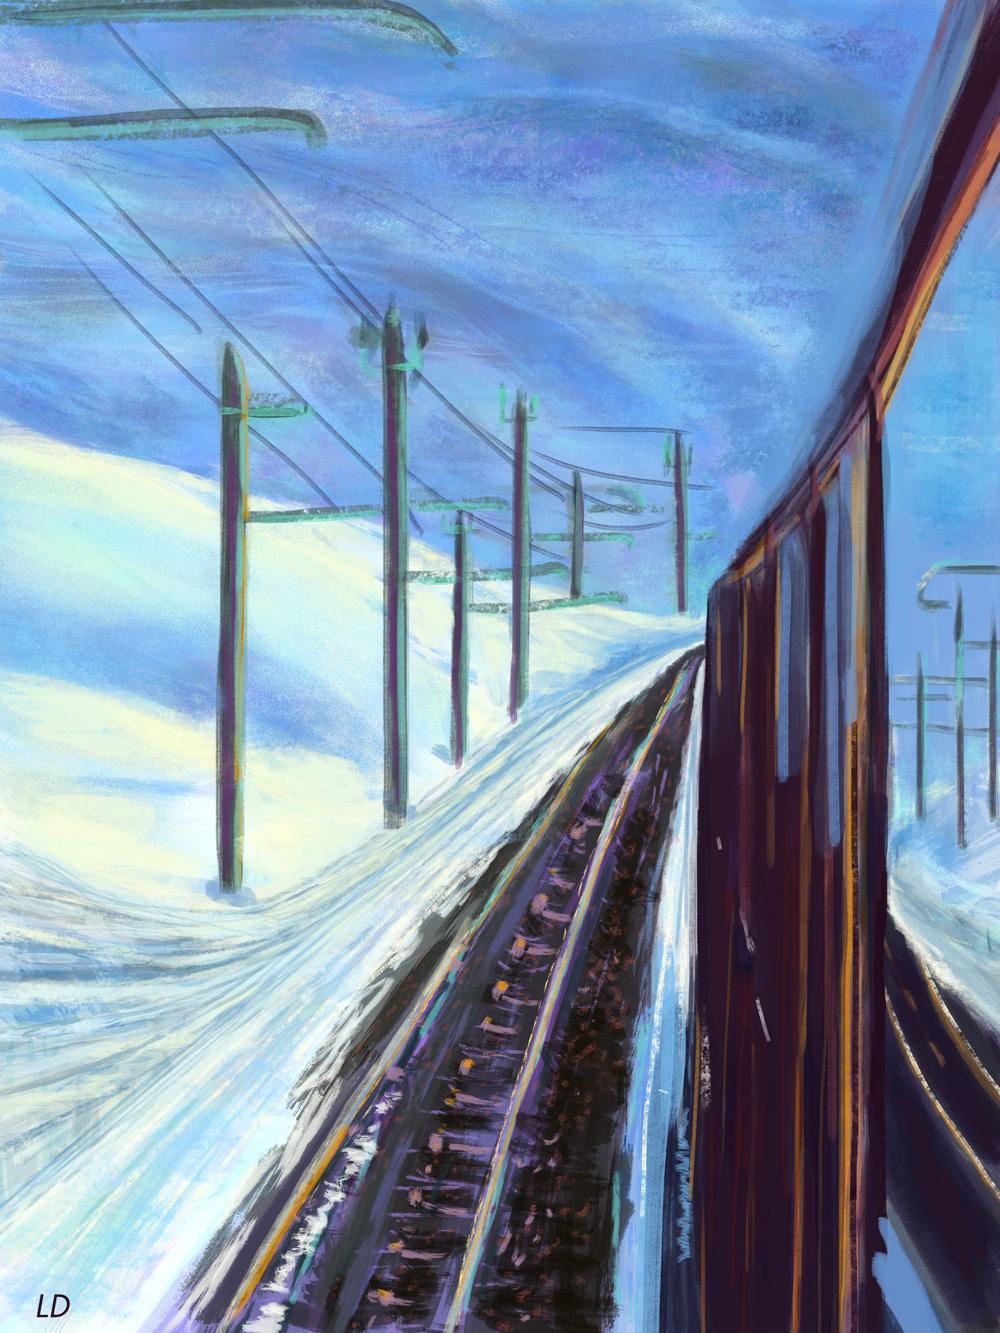 Richtung Gornergrat. Digital painting, 43x57, 2018